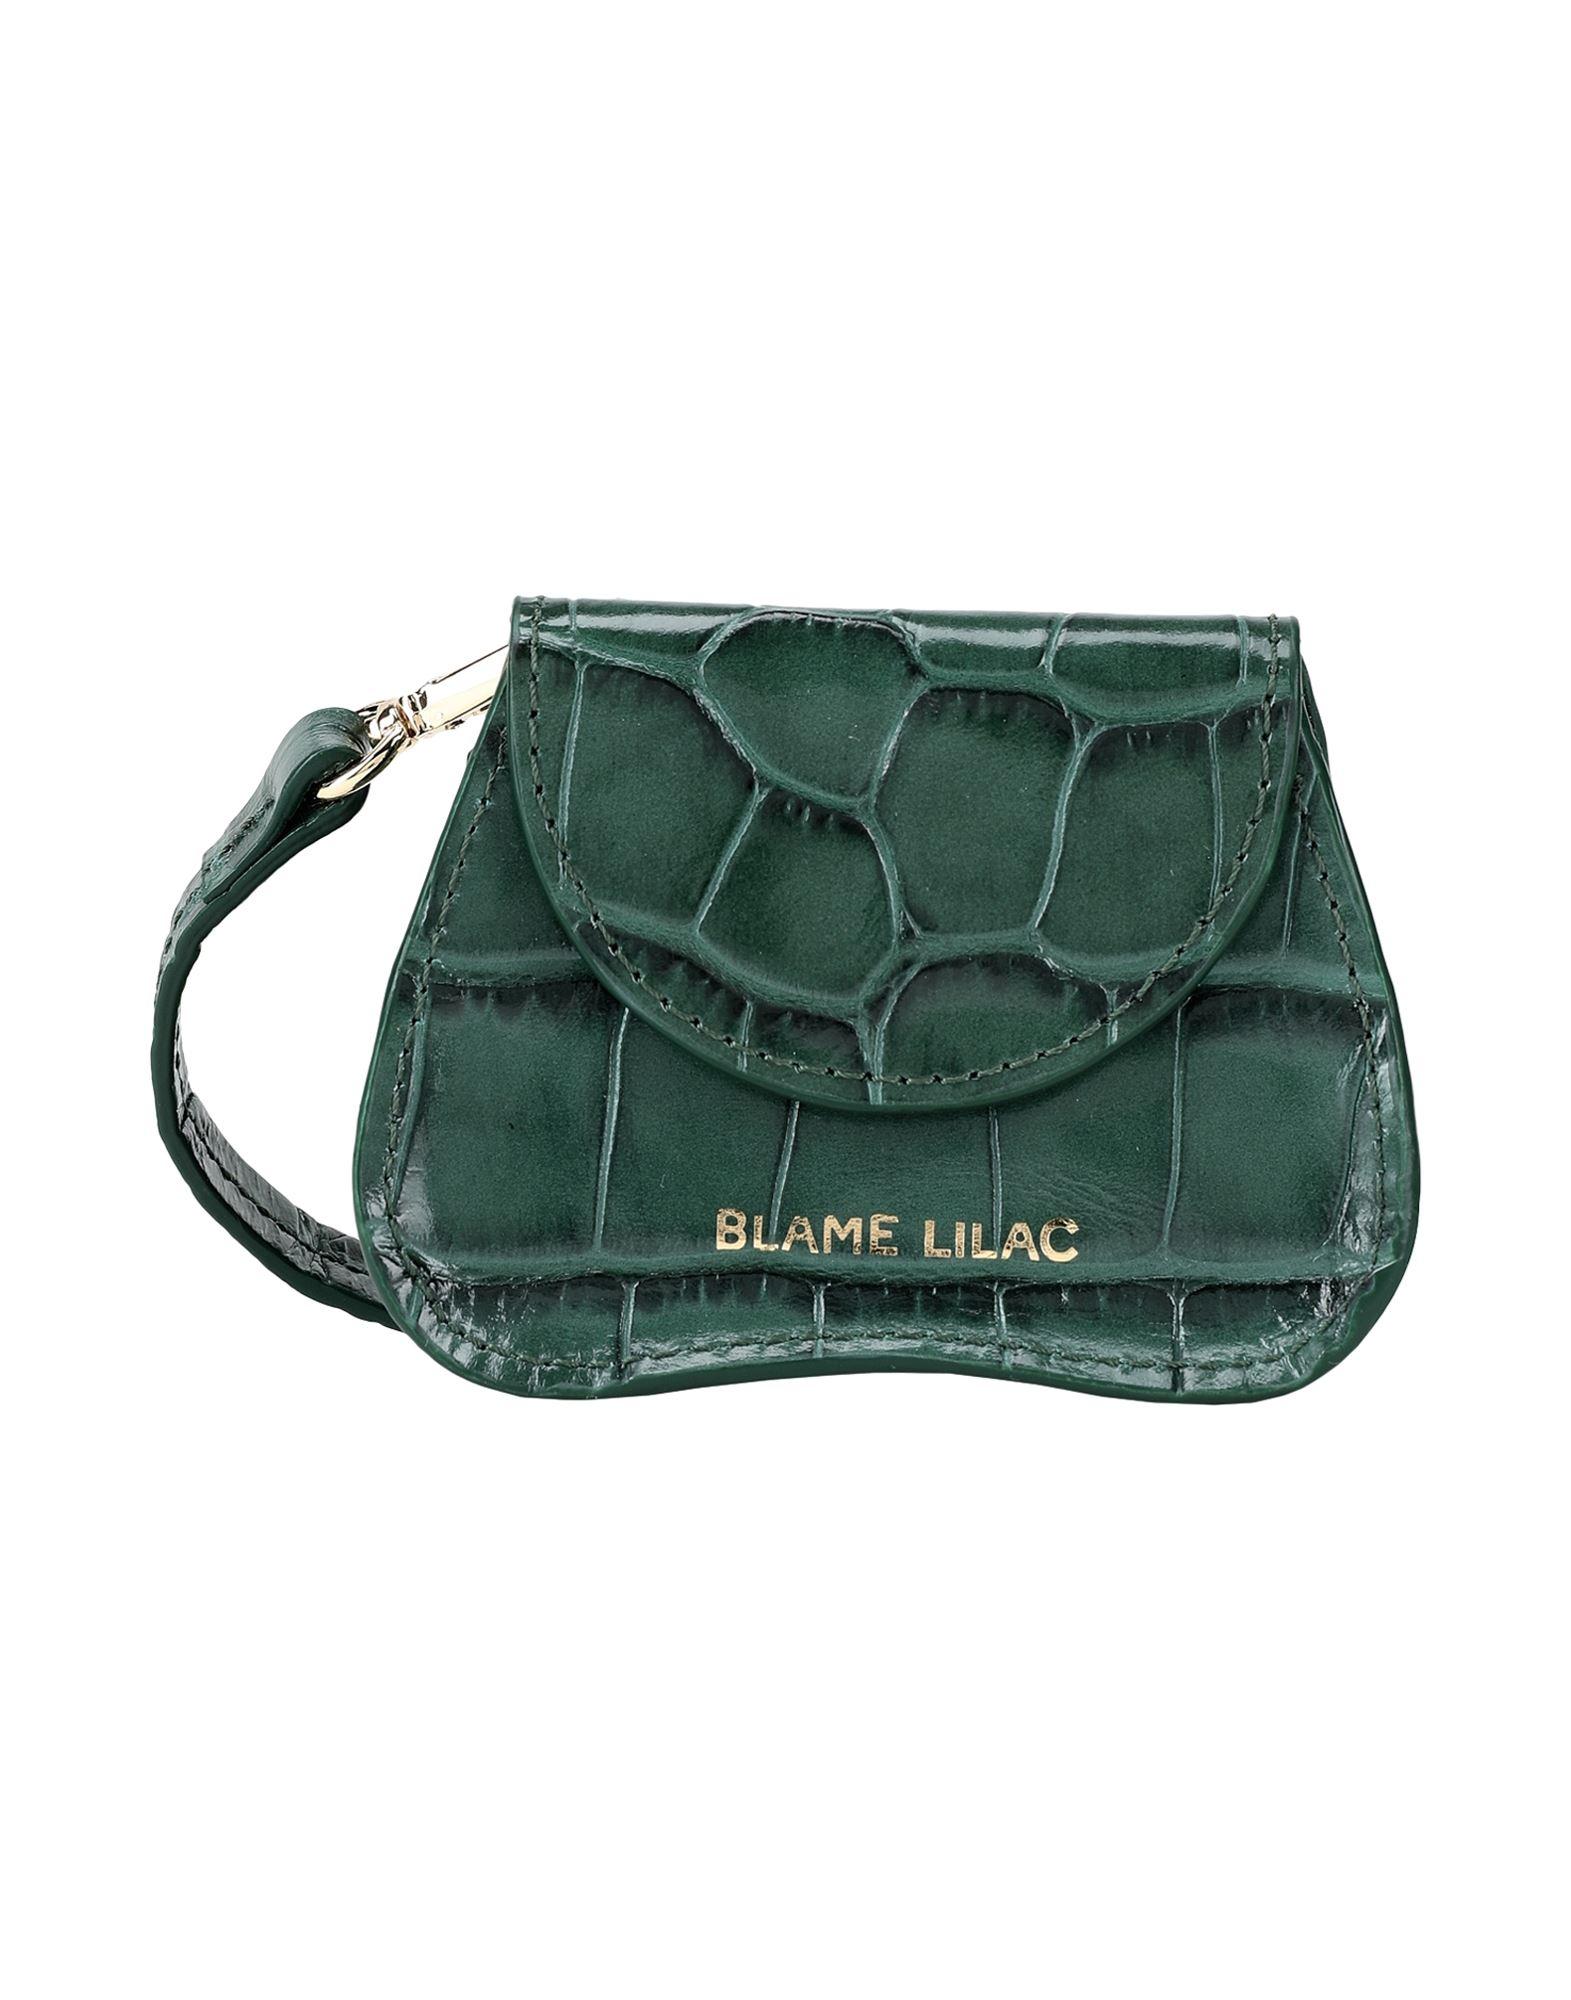 BLAME LILAC 크로스백 - Item 45559466